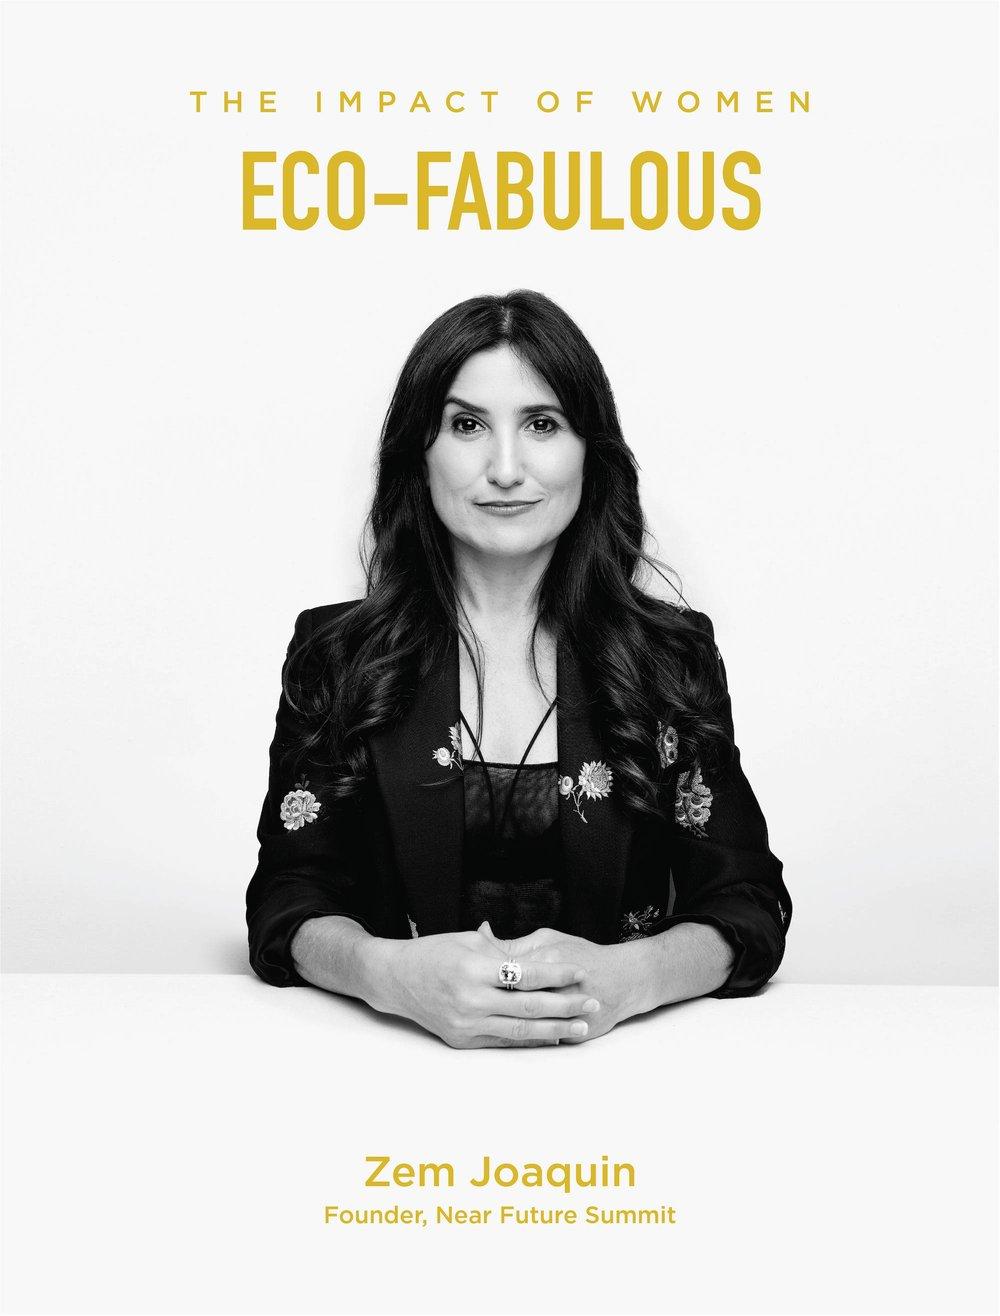 Zem Joaquin is Eco-Fabulous